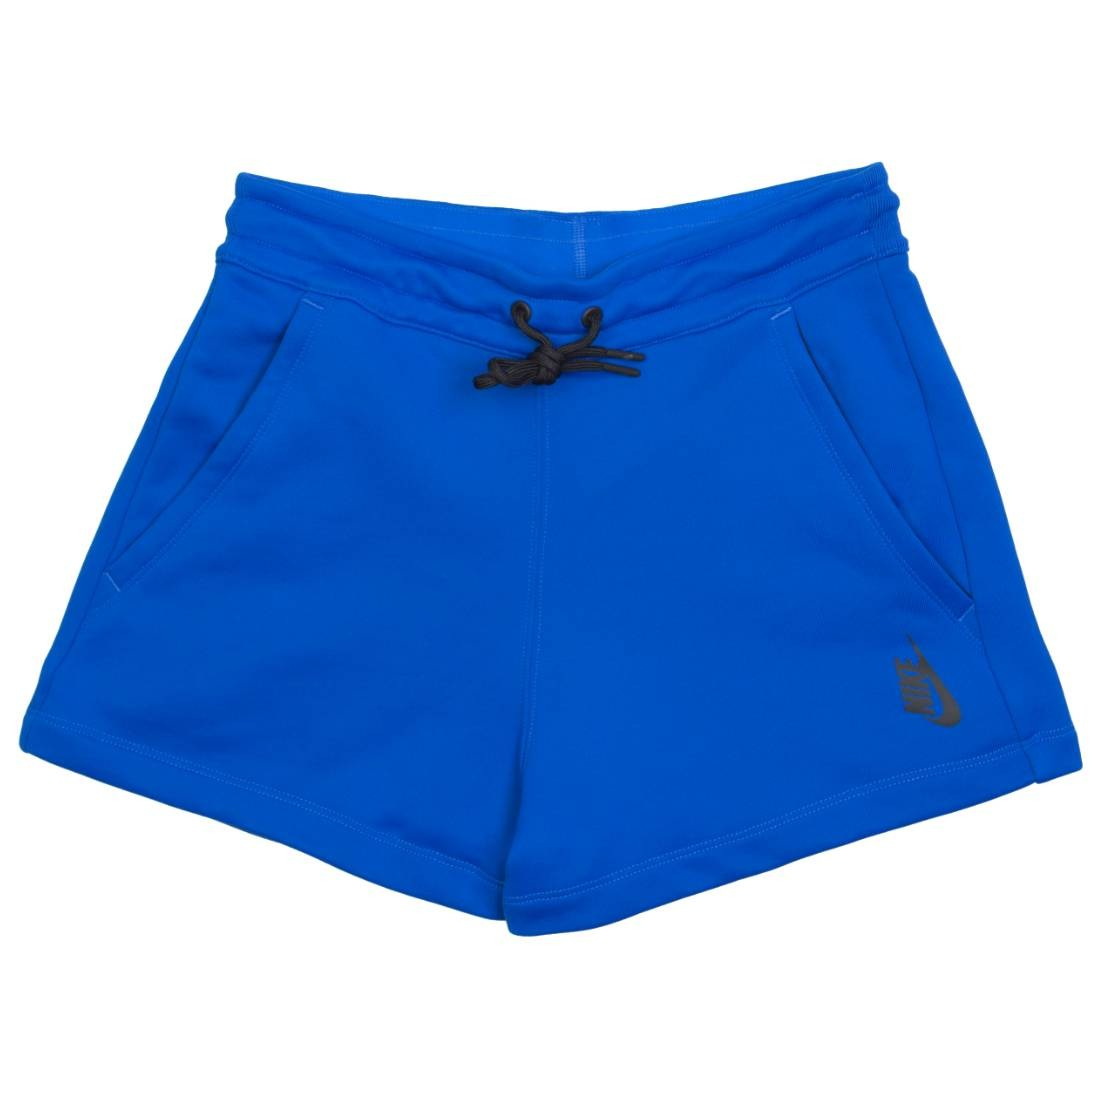 NikeLab Women Collection Shorts (hyper cobalt / black)